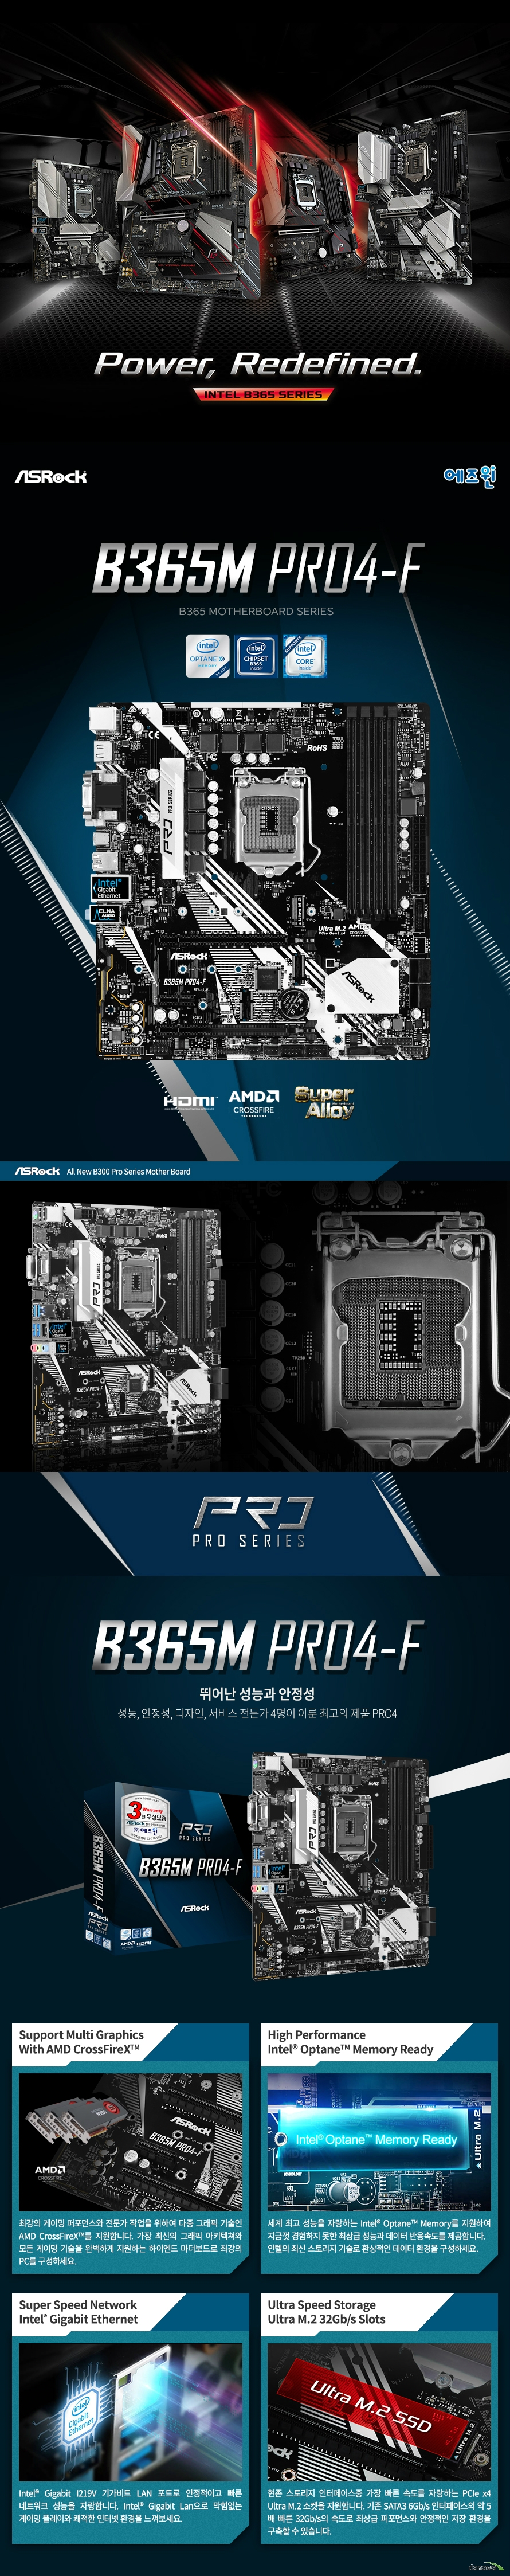 ASRock B365M Pro4-F 에즈윈  9세대 및 8세대 인텔 프로세서 지원 LGA1151소켓 인텔 터보 부스트 테크놀로지 2.0 지원  인텔 B365 칩셋 지원  듀얼채널 DDR4 DIMM 메모리 지원 최대 64GB 메모리 지원 DDR4 2666 2400 2133 NON ECC UN BUFFERED 메모리 지원 ECC UDIMM 메모리 모듈 지원 XMP 2.0 지원  PCIE 3.0 X16 슬롯 2개  PCIE 3.0 X1 슬롯 1개 AMD 쿼드 크로스 파이어 지원  인텔 i219v 기가비트 랜 지원  SATA3 커넥터 6개 지원 울트라 m.2 슬롯 1개 지원  USB 3.1 gen1 타입c 1개 USB 3.1 GEN1 타입A 6개  USB 2.0 6개 지원 리얼텍 ALC892 7.1채널 HD 오디오 코덱 지원 윈도우 10 64비트 지원   KC인증 R R ASR B365MPRO4F  제조사의 사정에 따라 사전고지 없이 일부 제품사양이 변경될 수 있으며, 더 자세한 정보는 제조사 홈페이지 또는 제품 매뉴얼을 참고해주시기 바랍니다.  제품 구성   사용자 매뉴얼 드라이버 설치 cd m.2 고정나사 SATA3 케이블 IO쉴드  최고의 고객 만족을 위하여 에즈윈에서는 3년 무상 품질 보증 서비스를 제공합니다.